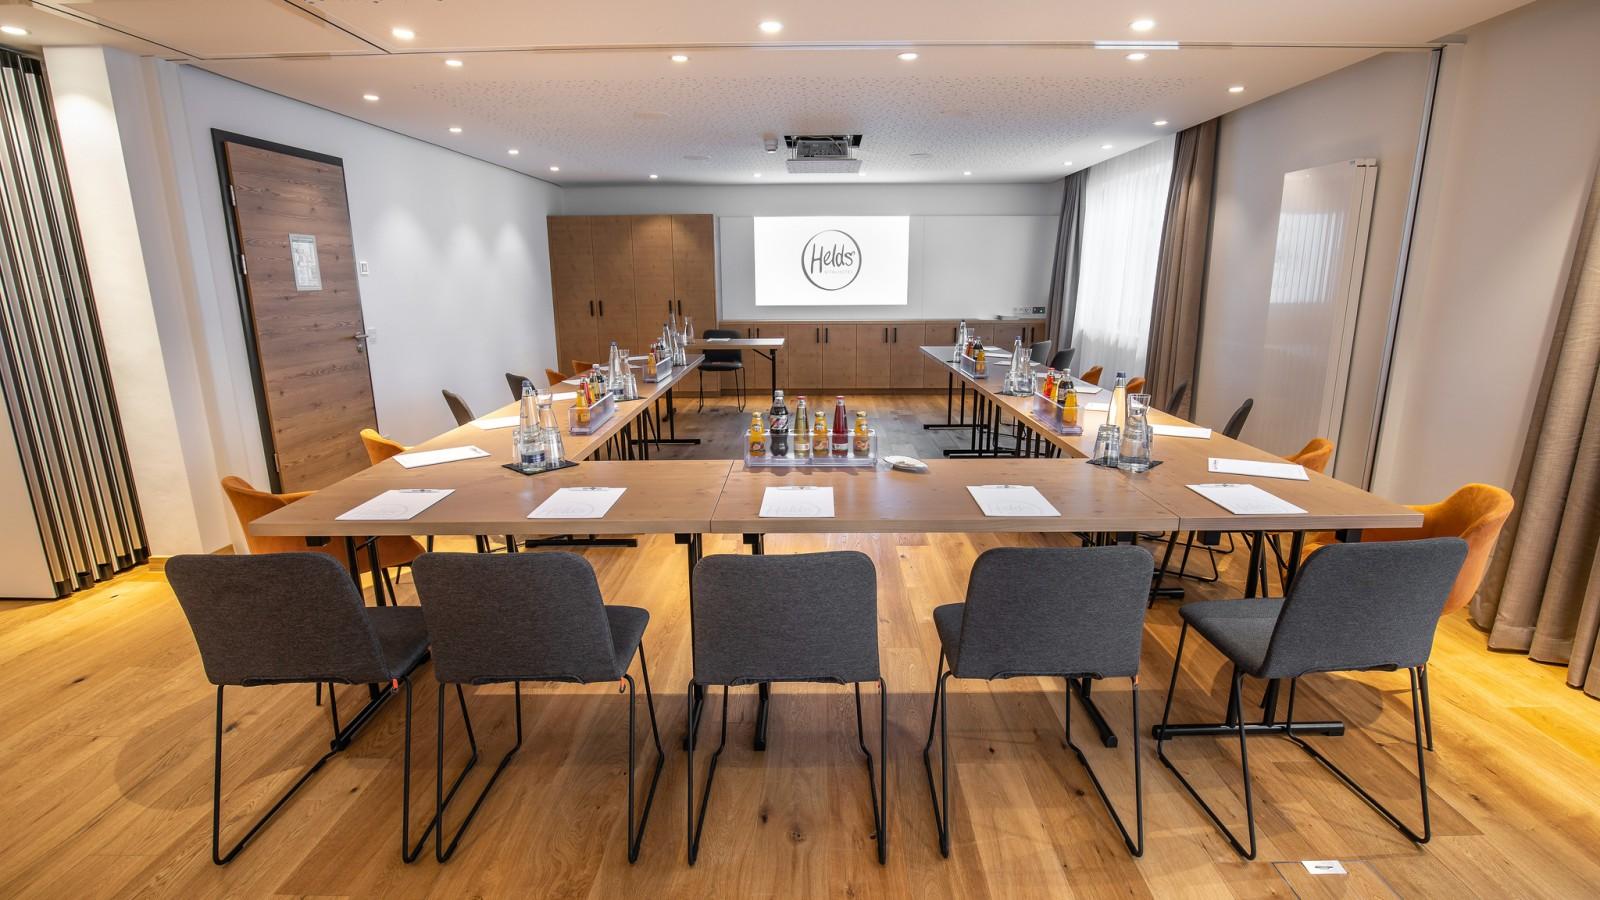 HELDs Vitalhotel | Conference Room Max&Moritz